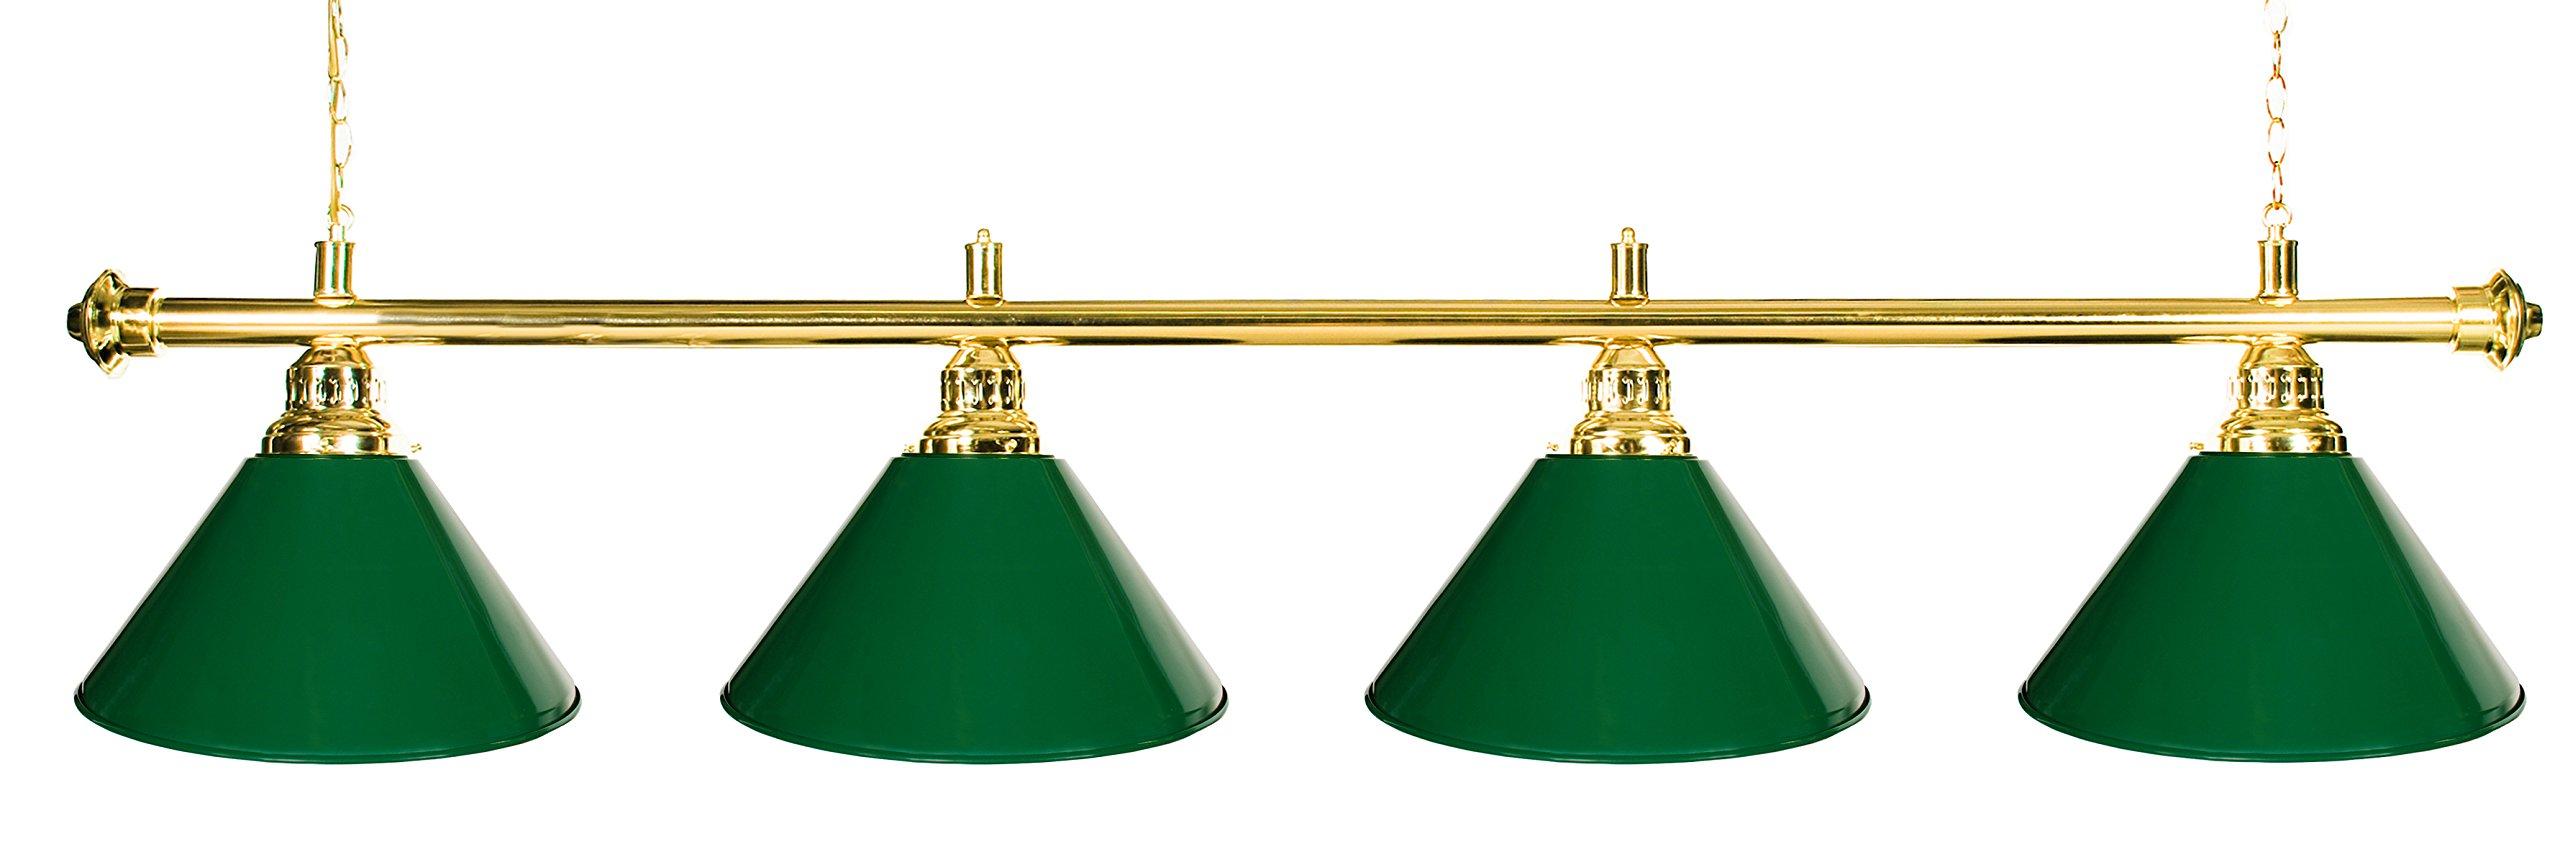 72'' Pool Table Light - Billiard Lamp Brass Rod Choose Burgundy, Green or Black Metal Shades (Brass Green)